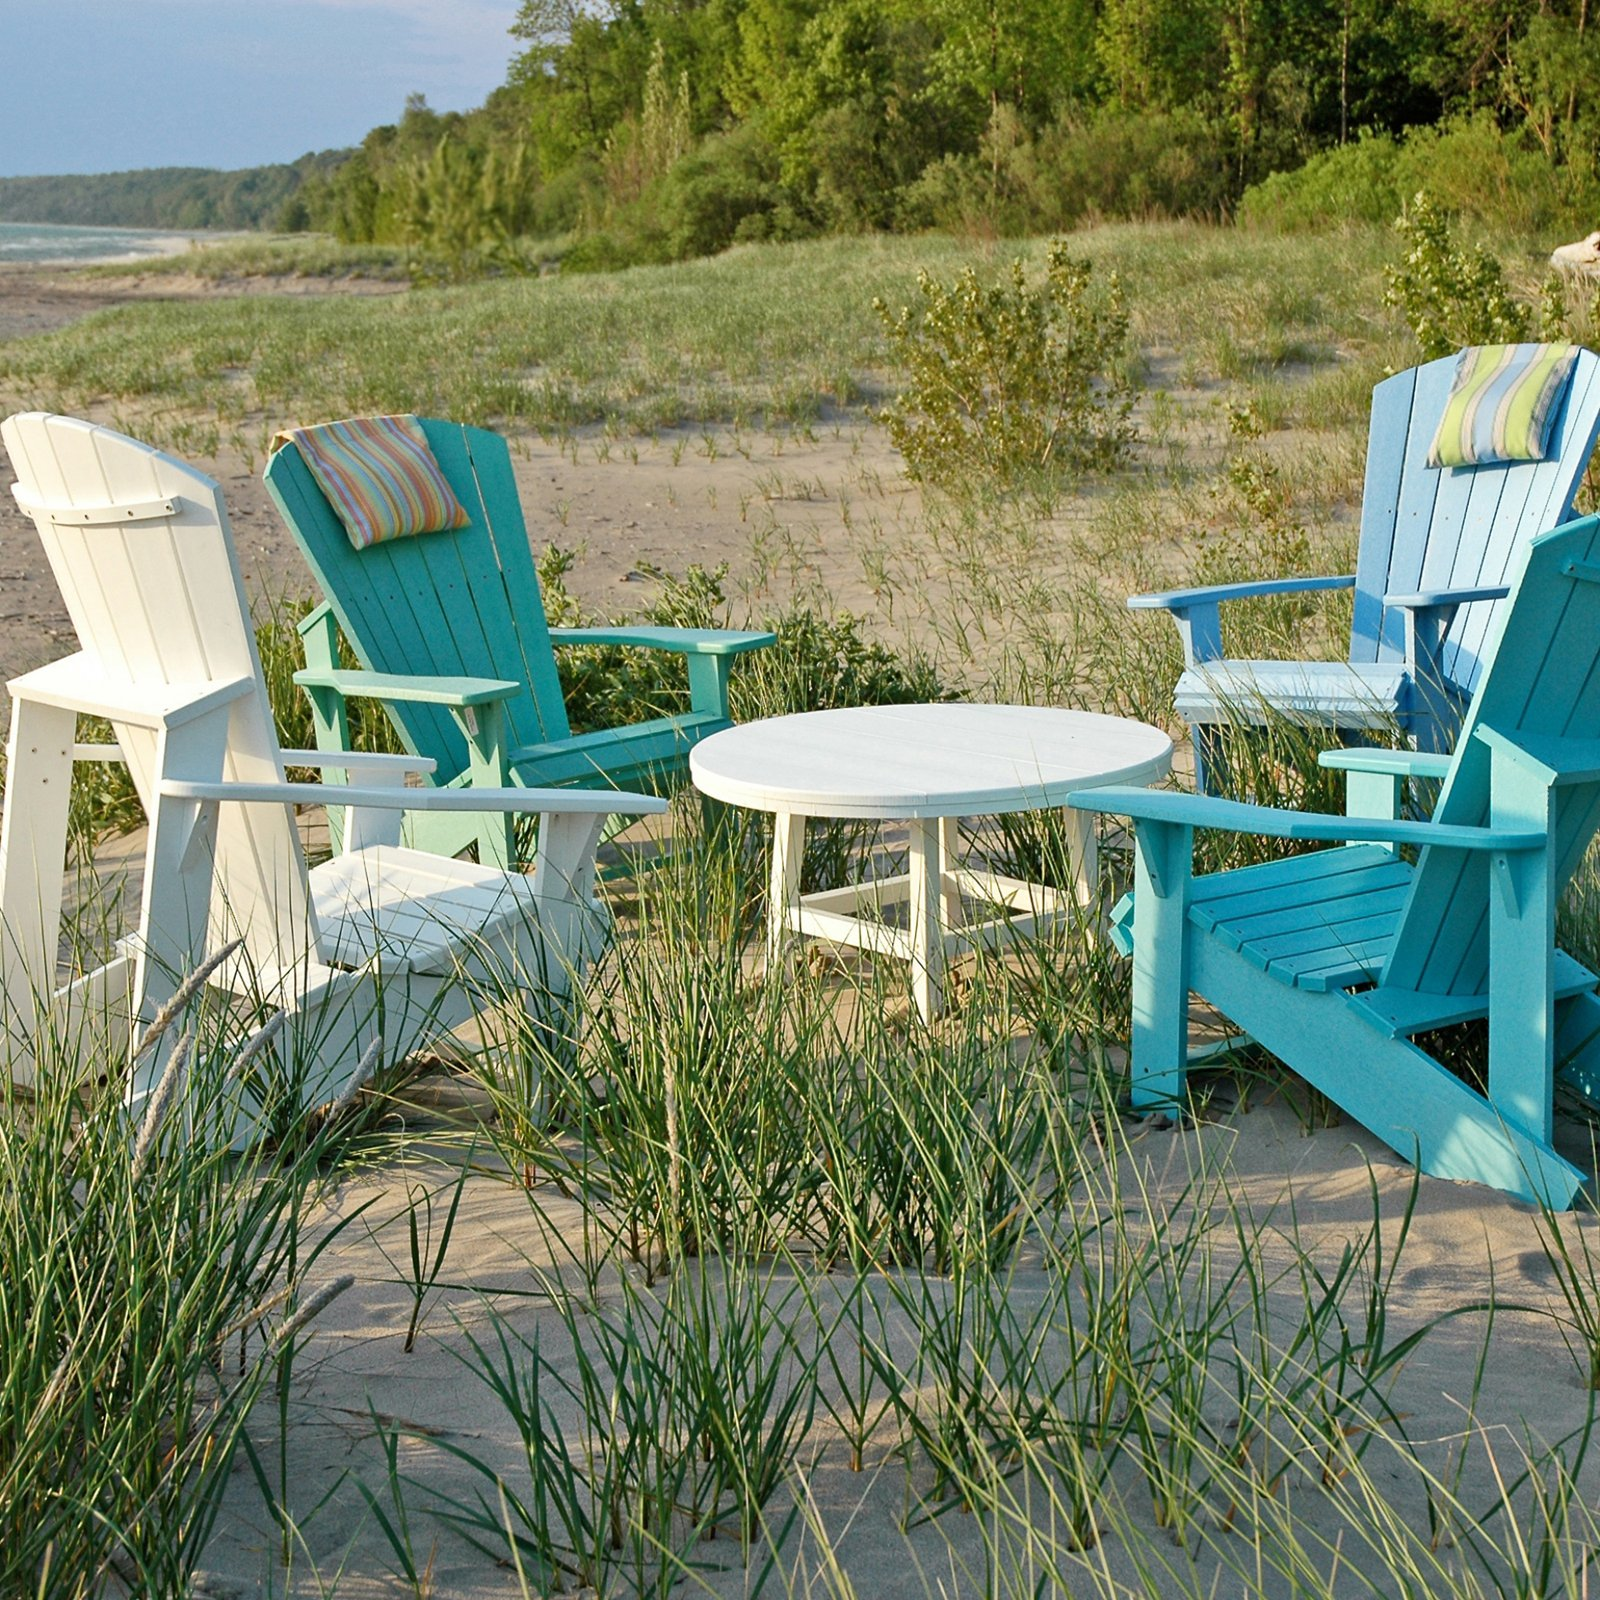 Beau CR Plastic Generations Upright Adirondack Chair   Walmart.com